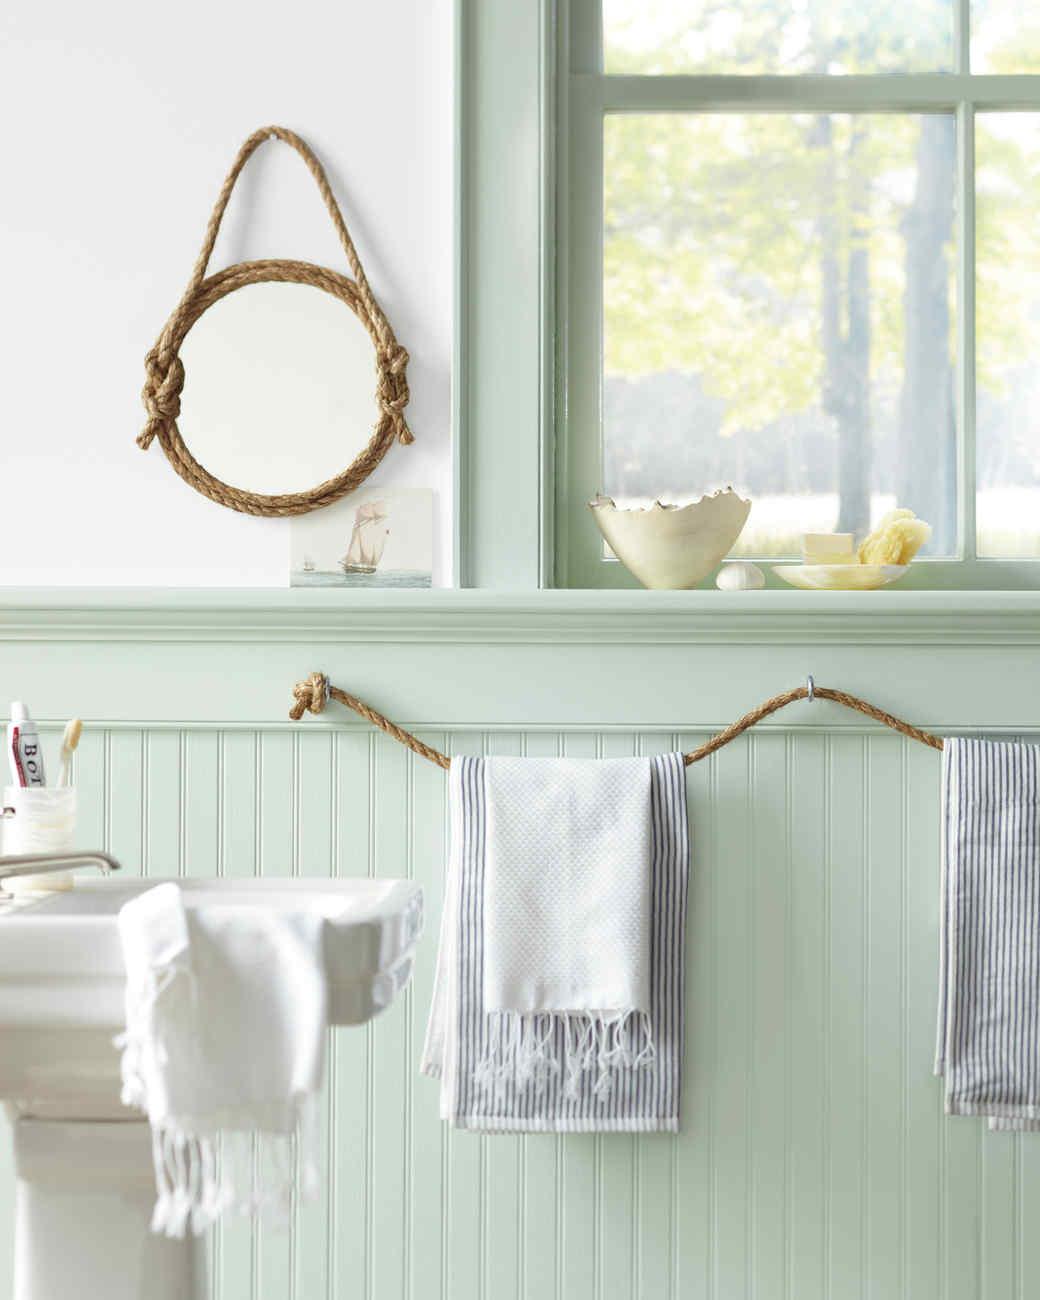 Rope Decorating Ideas | Martha Stewart